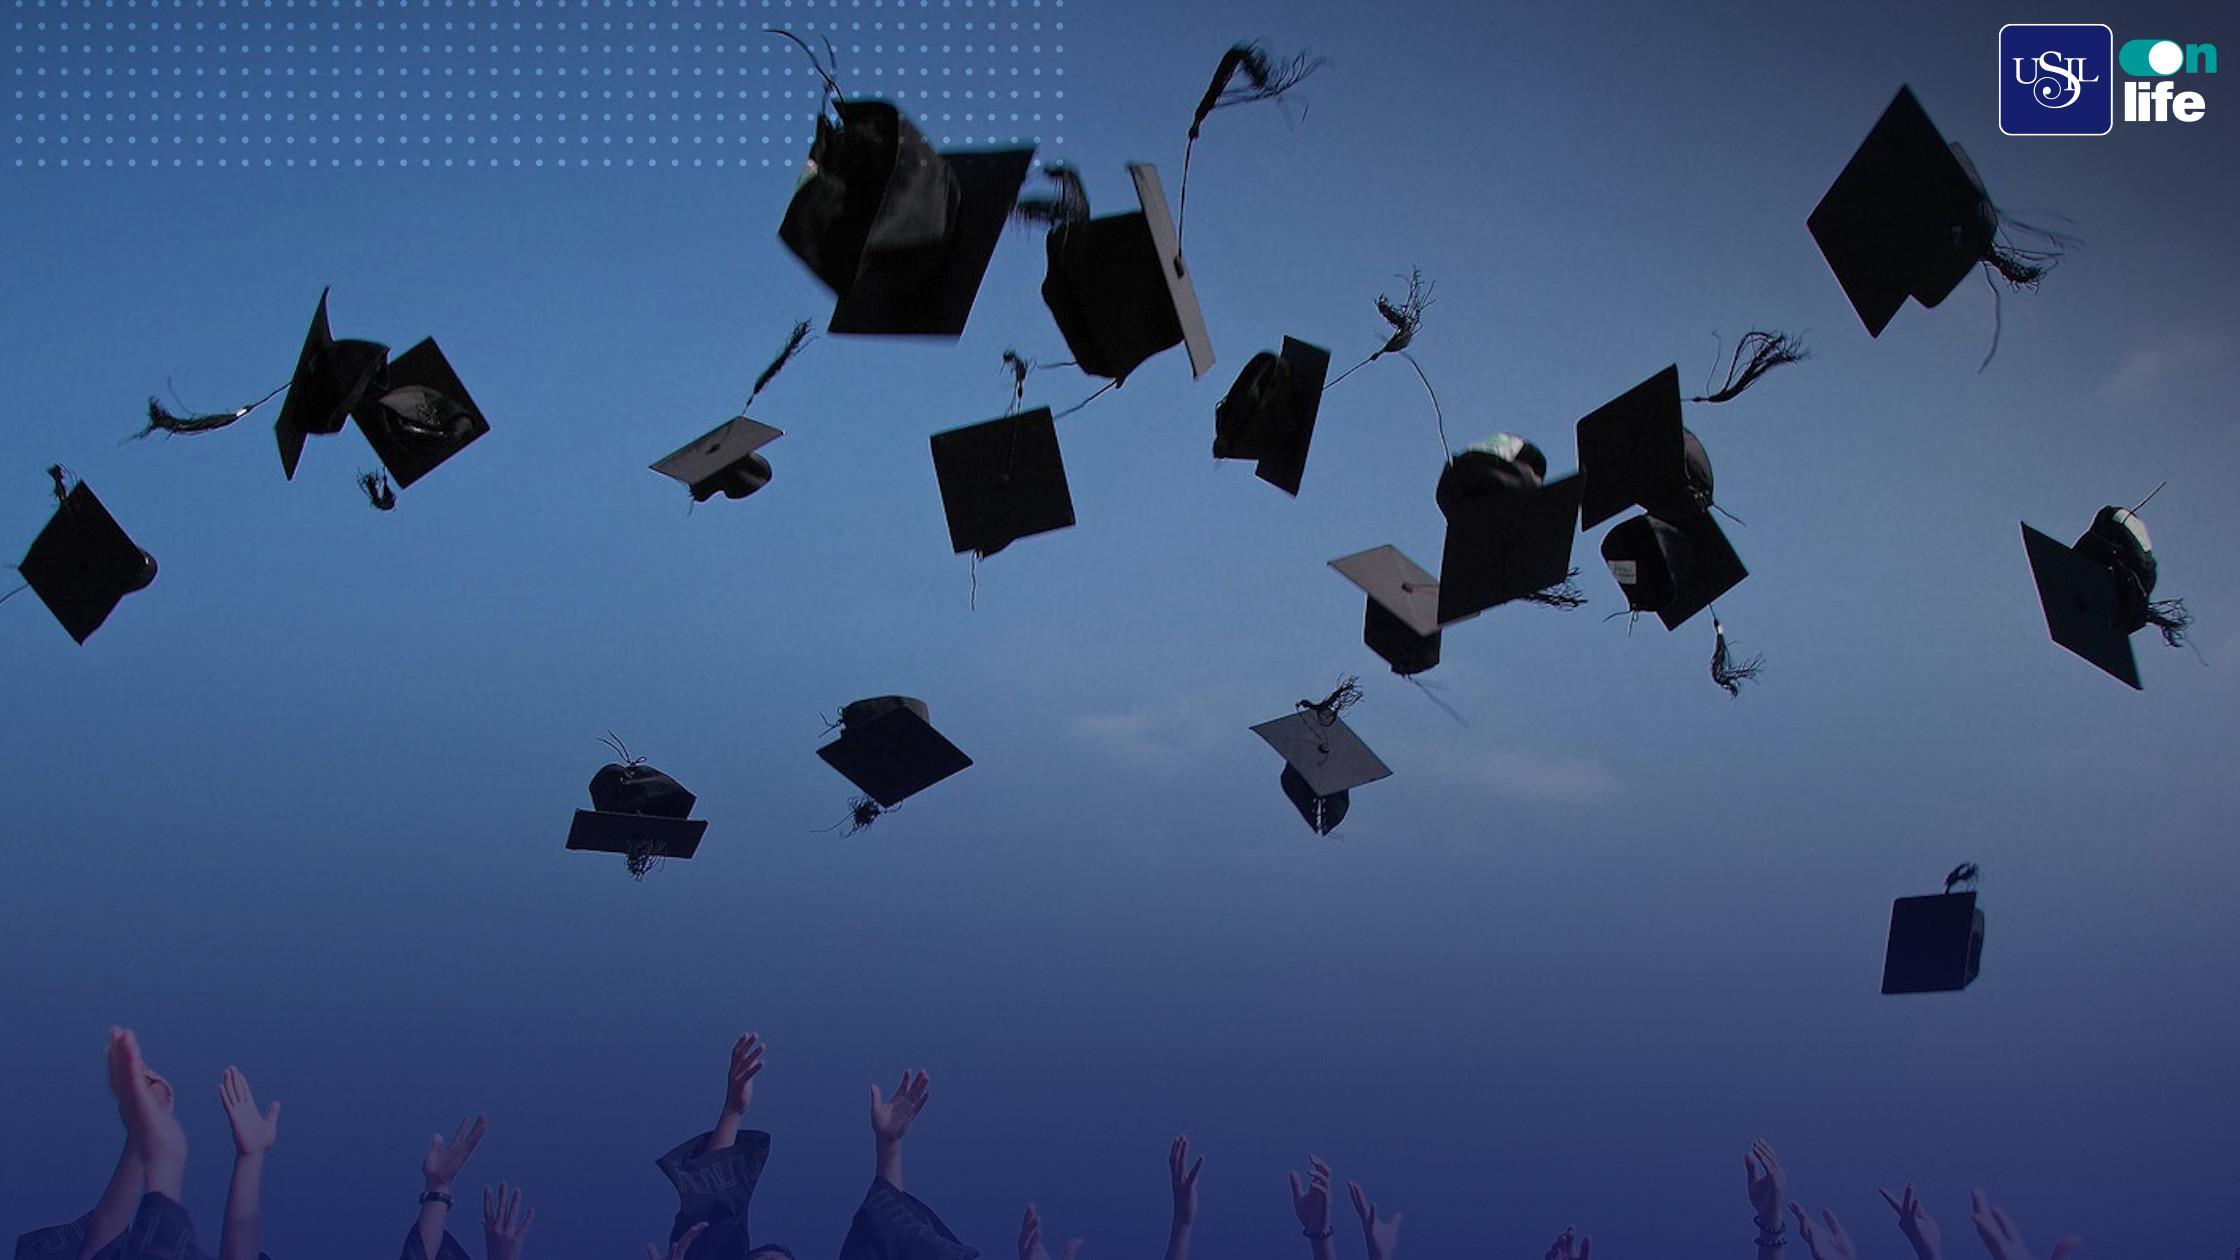 http://actualidad.usilonlife.com/es/usil-entre-las-diez-universidades-mas-innovadoras-de-iberoamerica